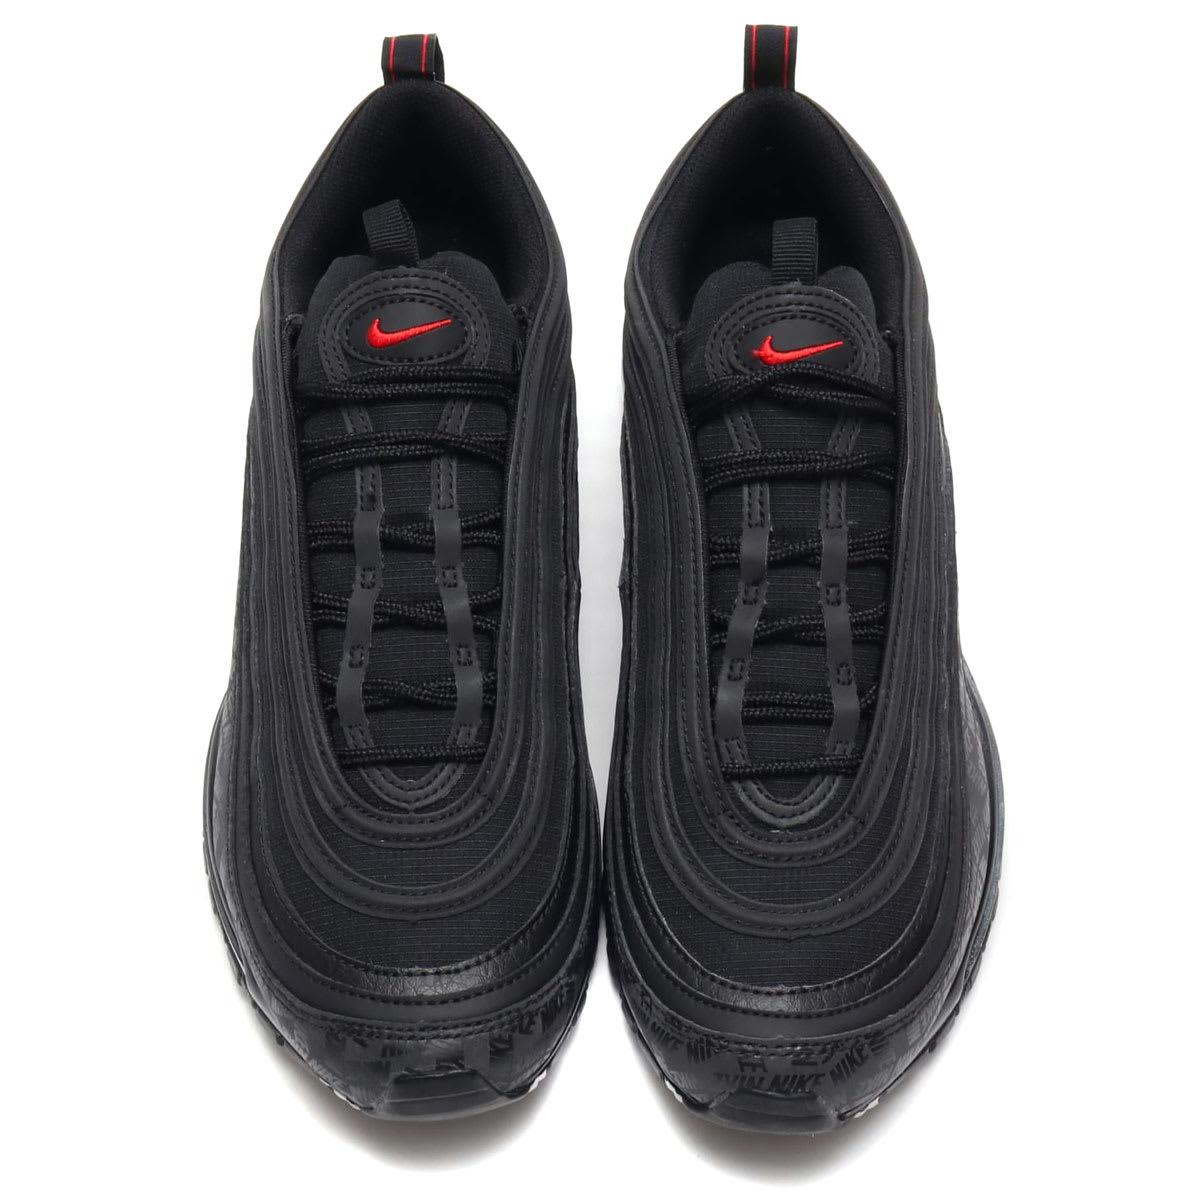 Nike Air Max 97 Black/University Red-Black AR4259-001 (Top)